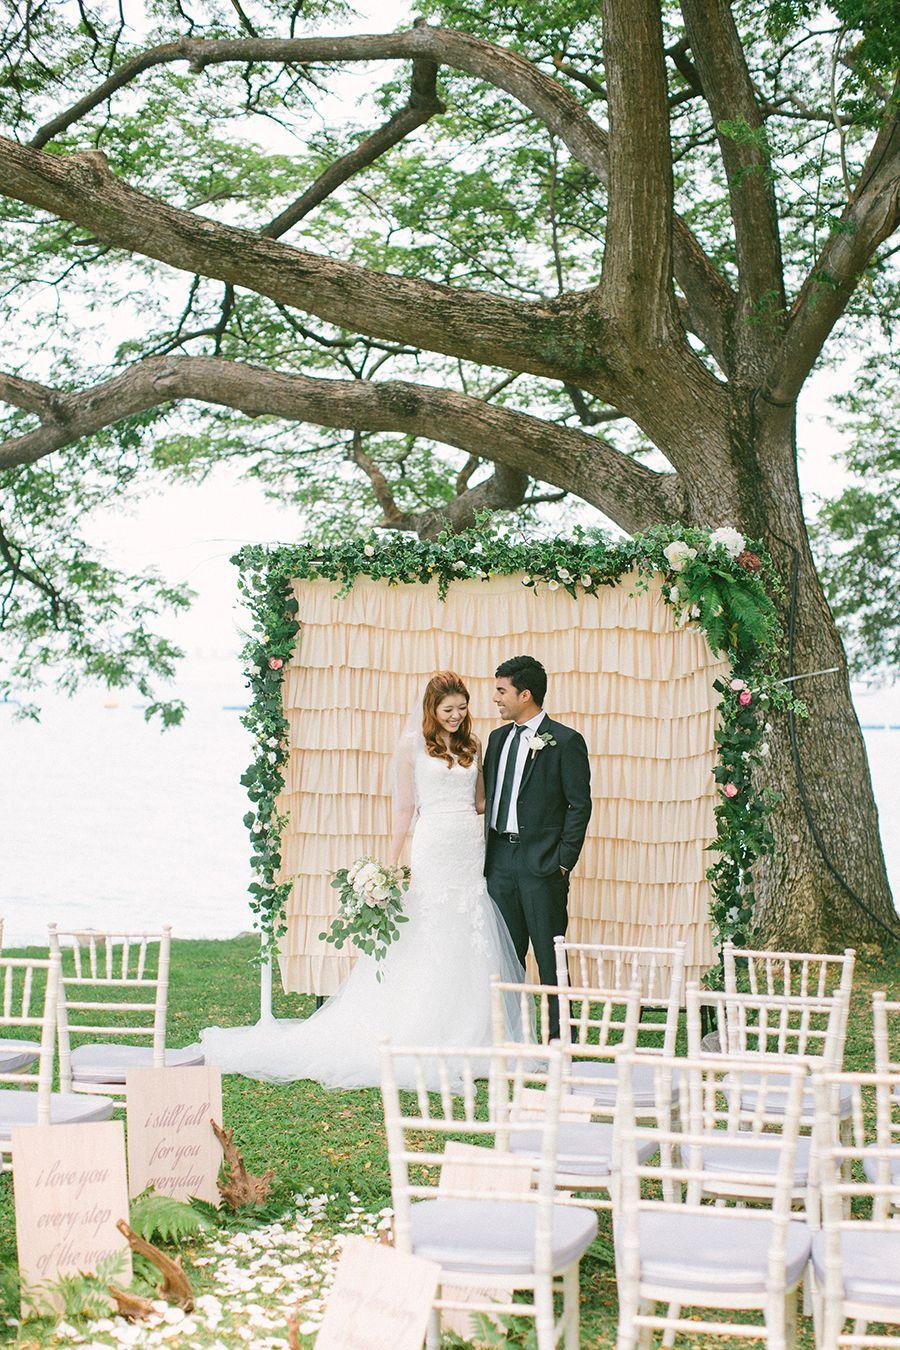 Creative Wedding Backdrops A Styled Shoot Wedding Backdrop Wedding Styled Shoot